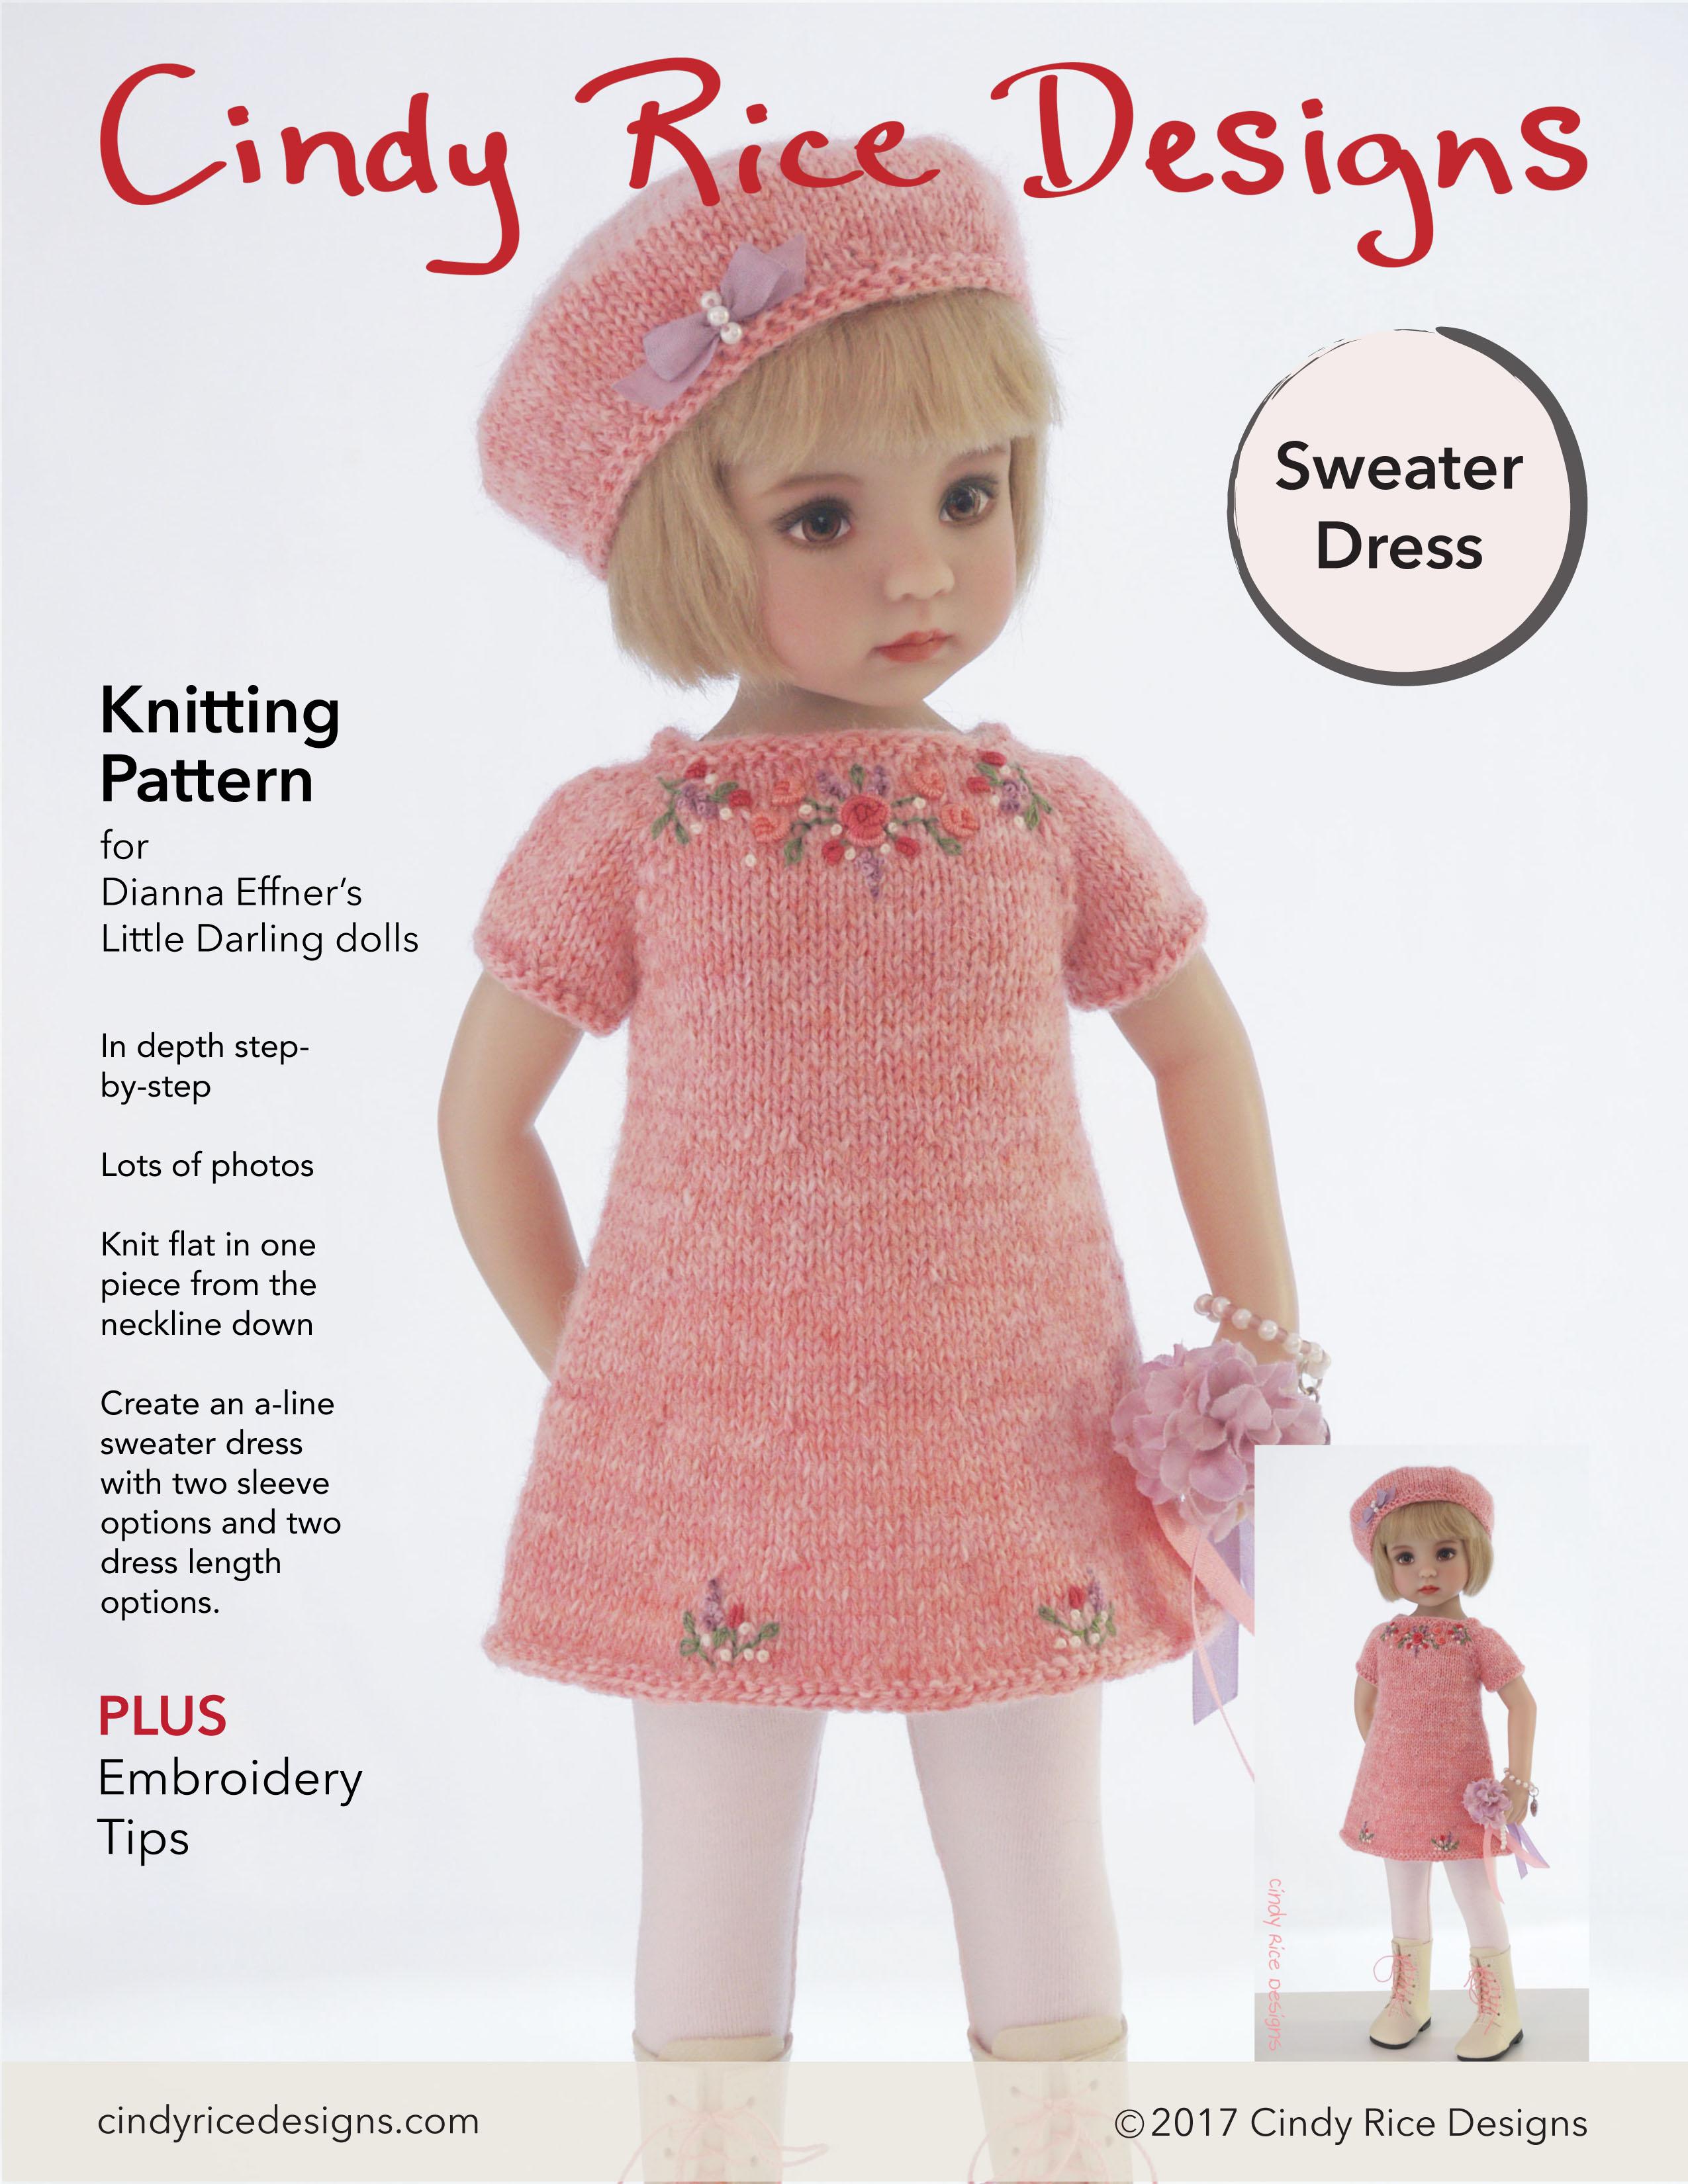 New Knitting Pattern   Cindy Rice Designs